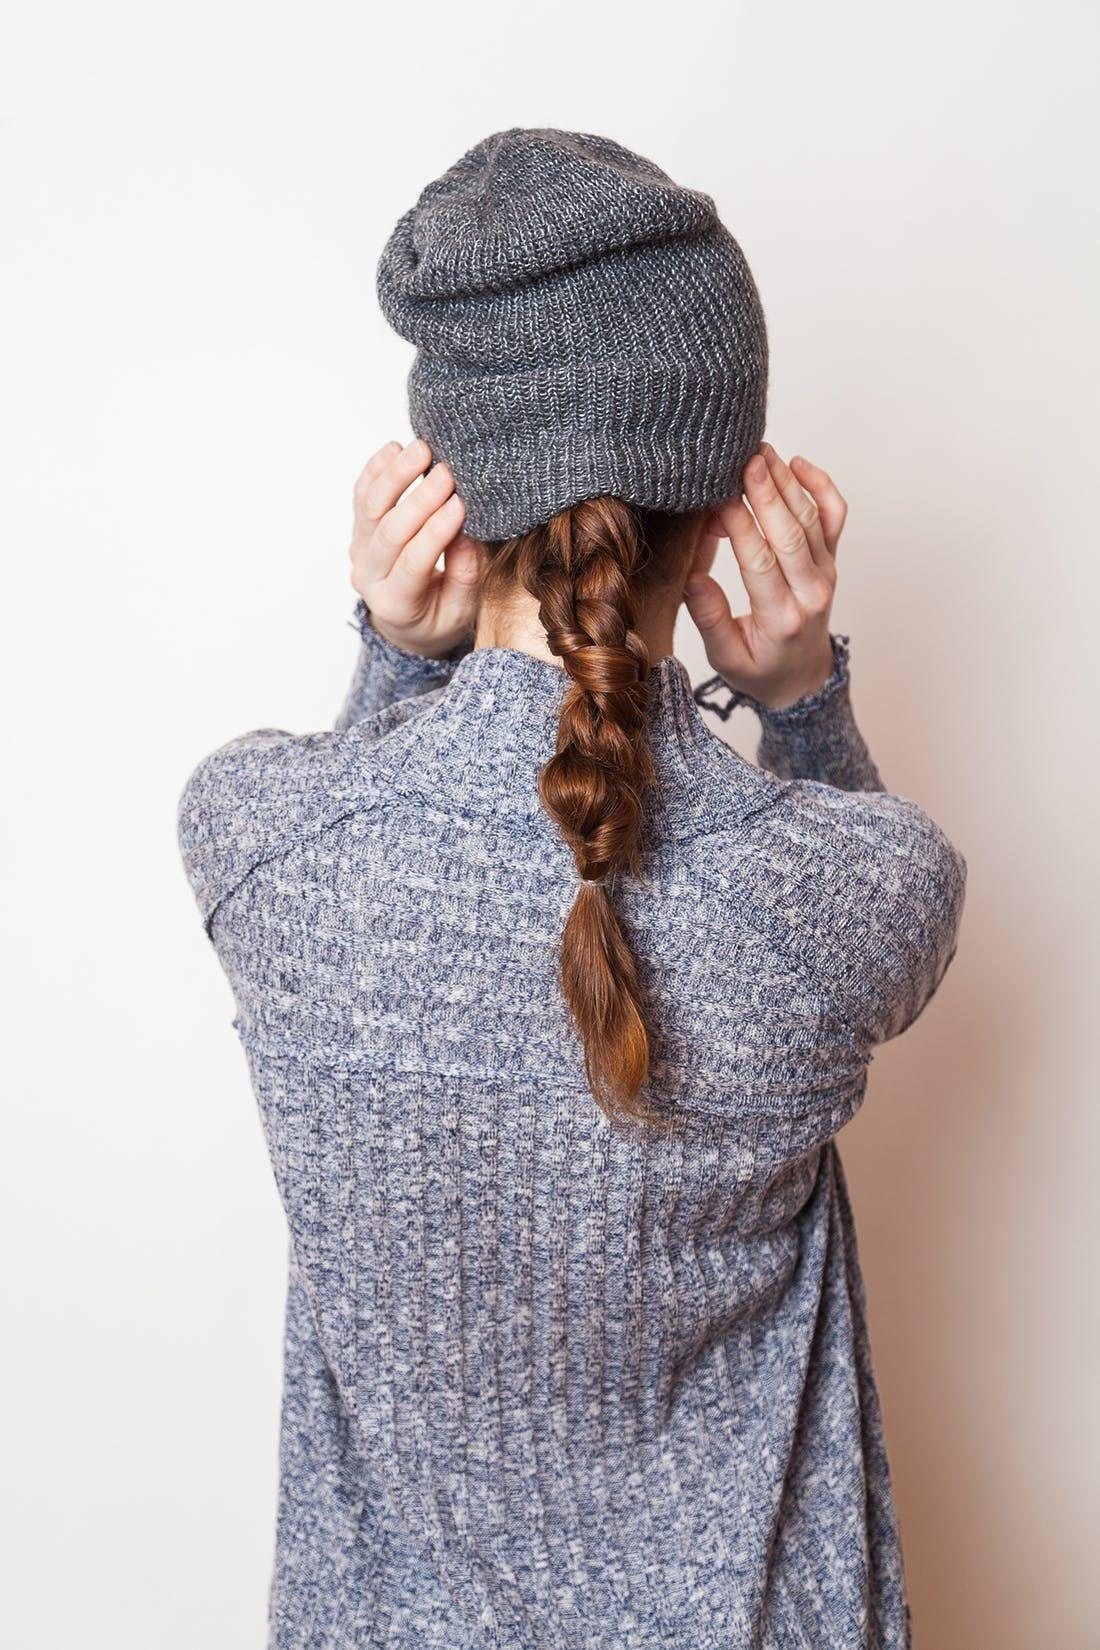 Park Art|My WordPress Blog_Long Hair With Hard Hat